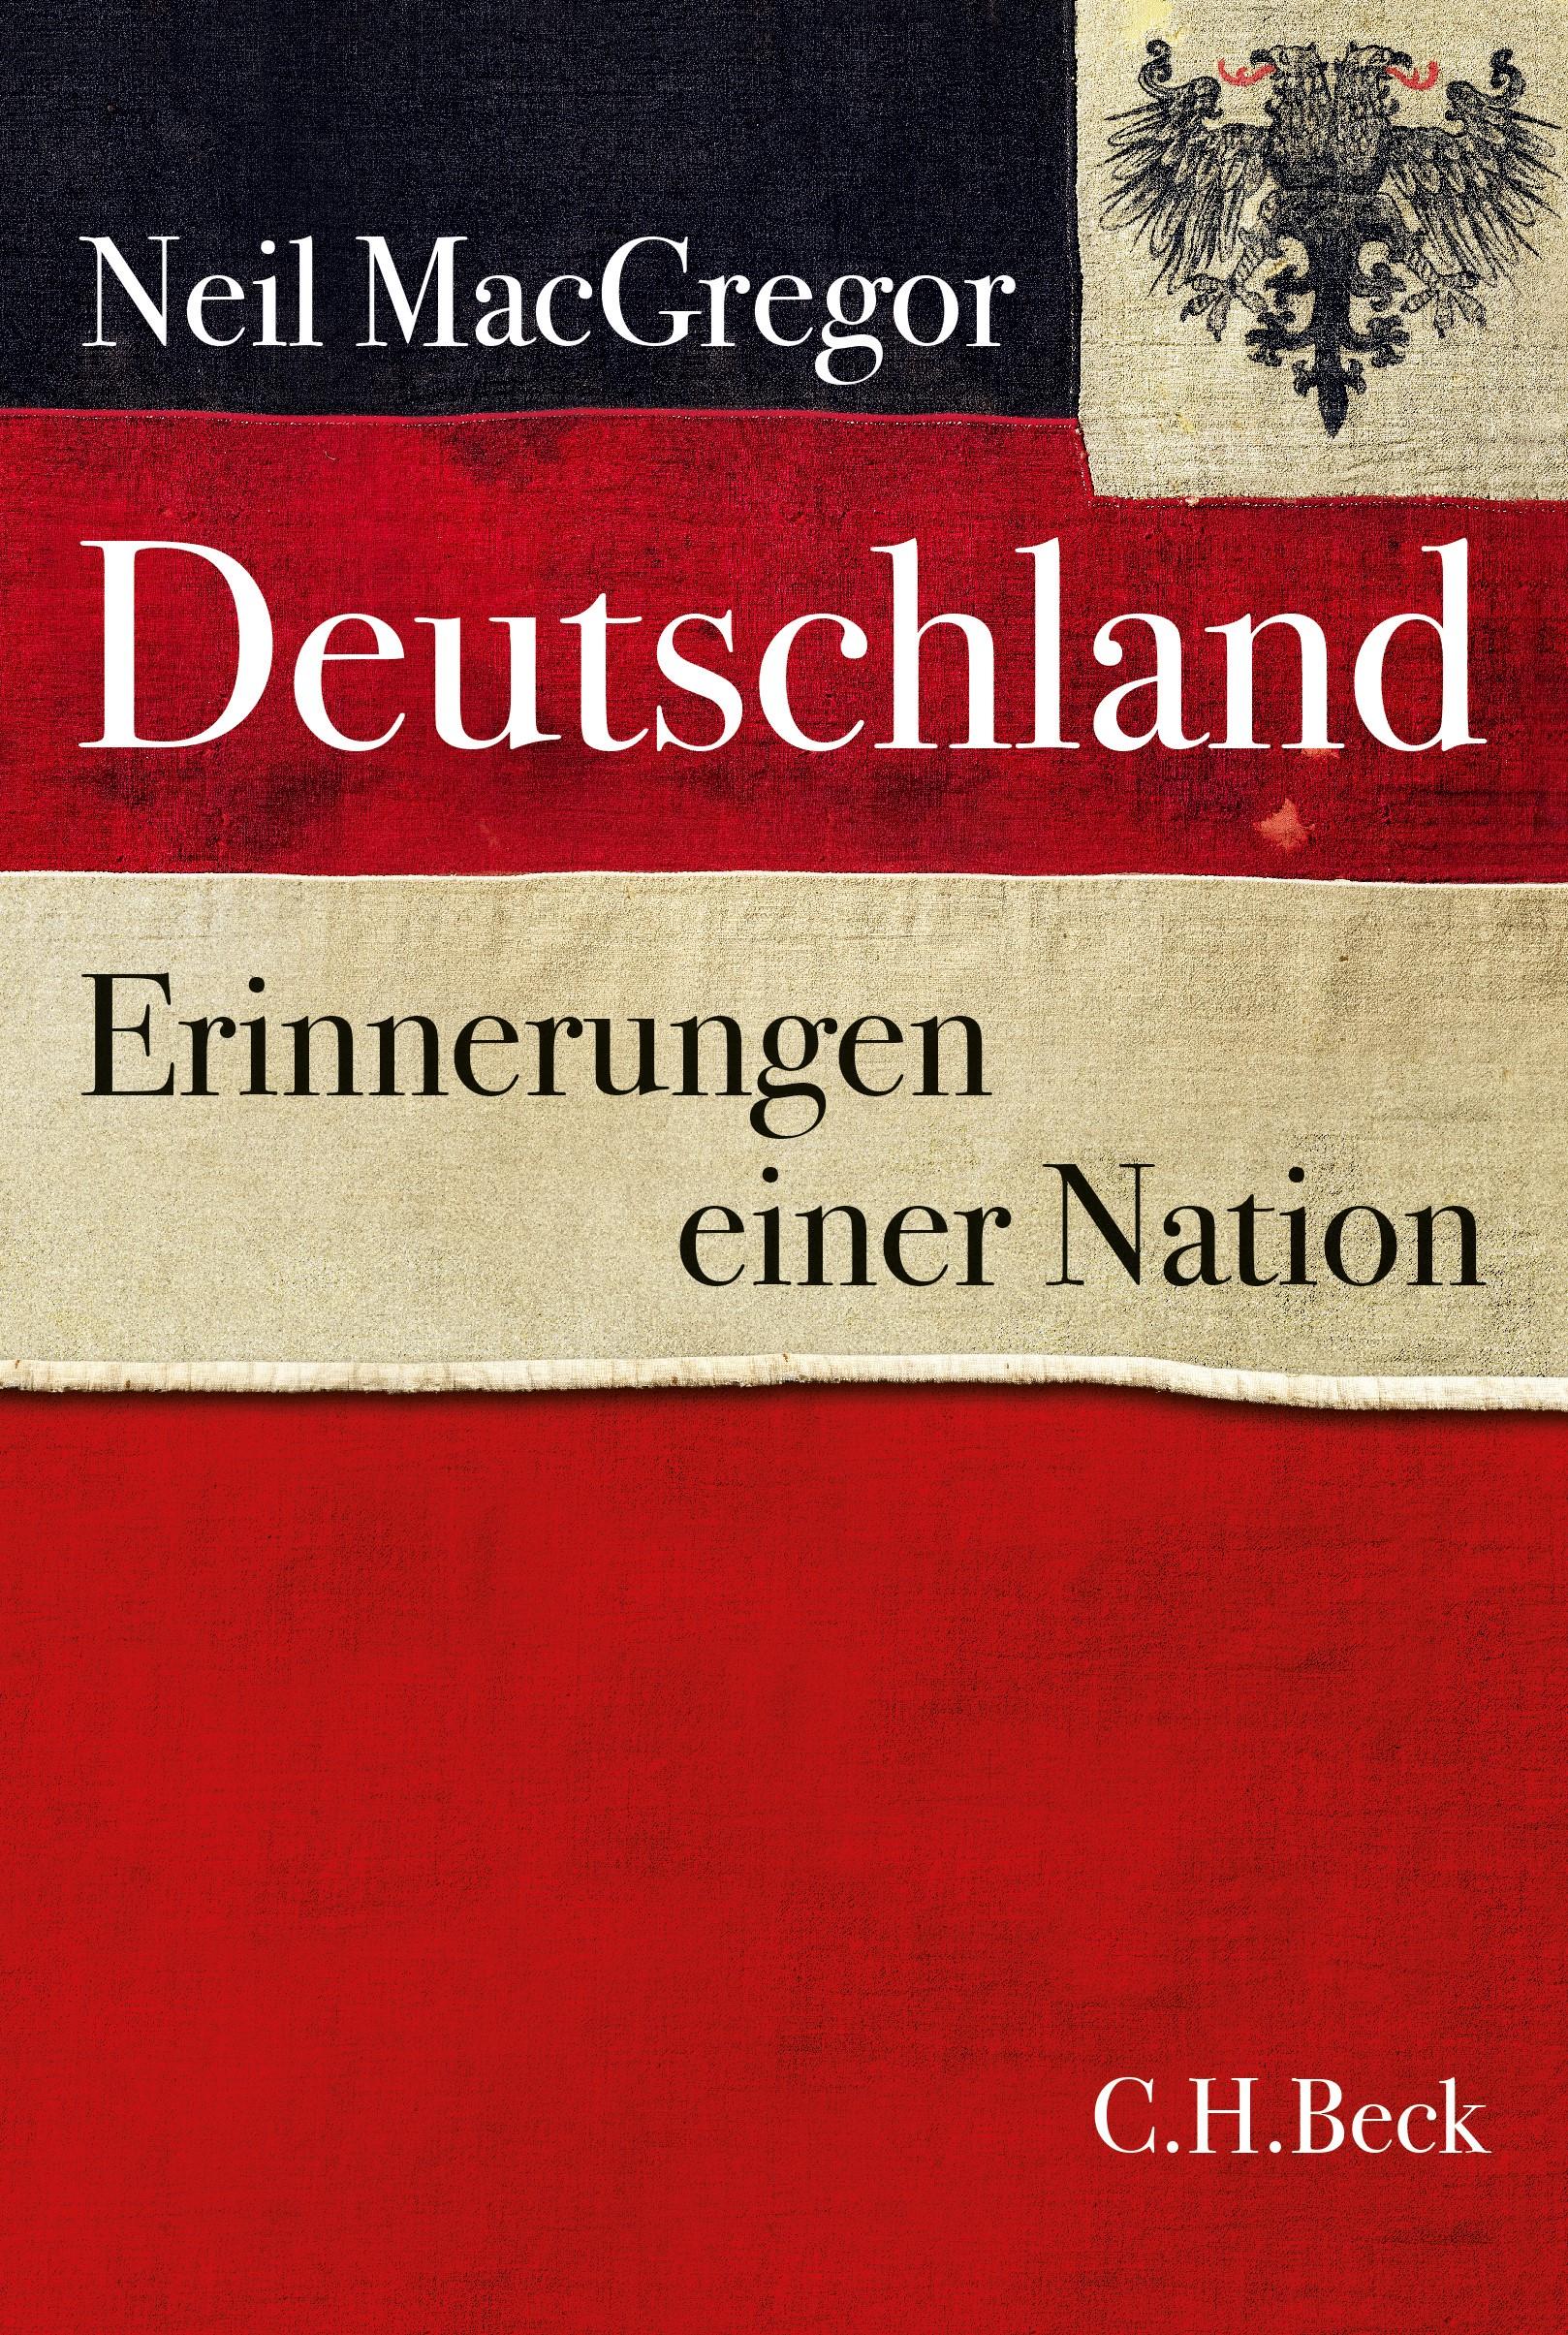 Deutschland | MacGregor, Neil, 2017 | Buch (Cover)